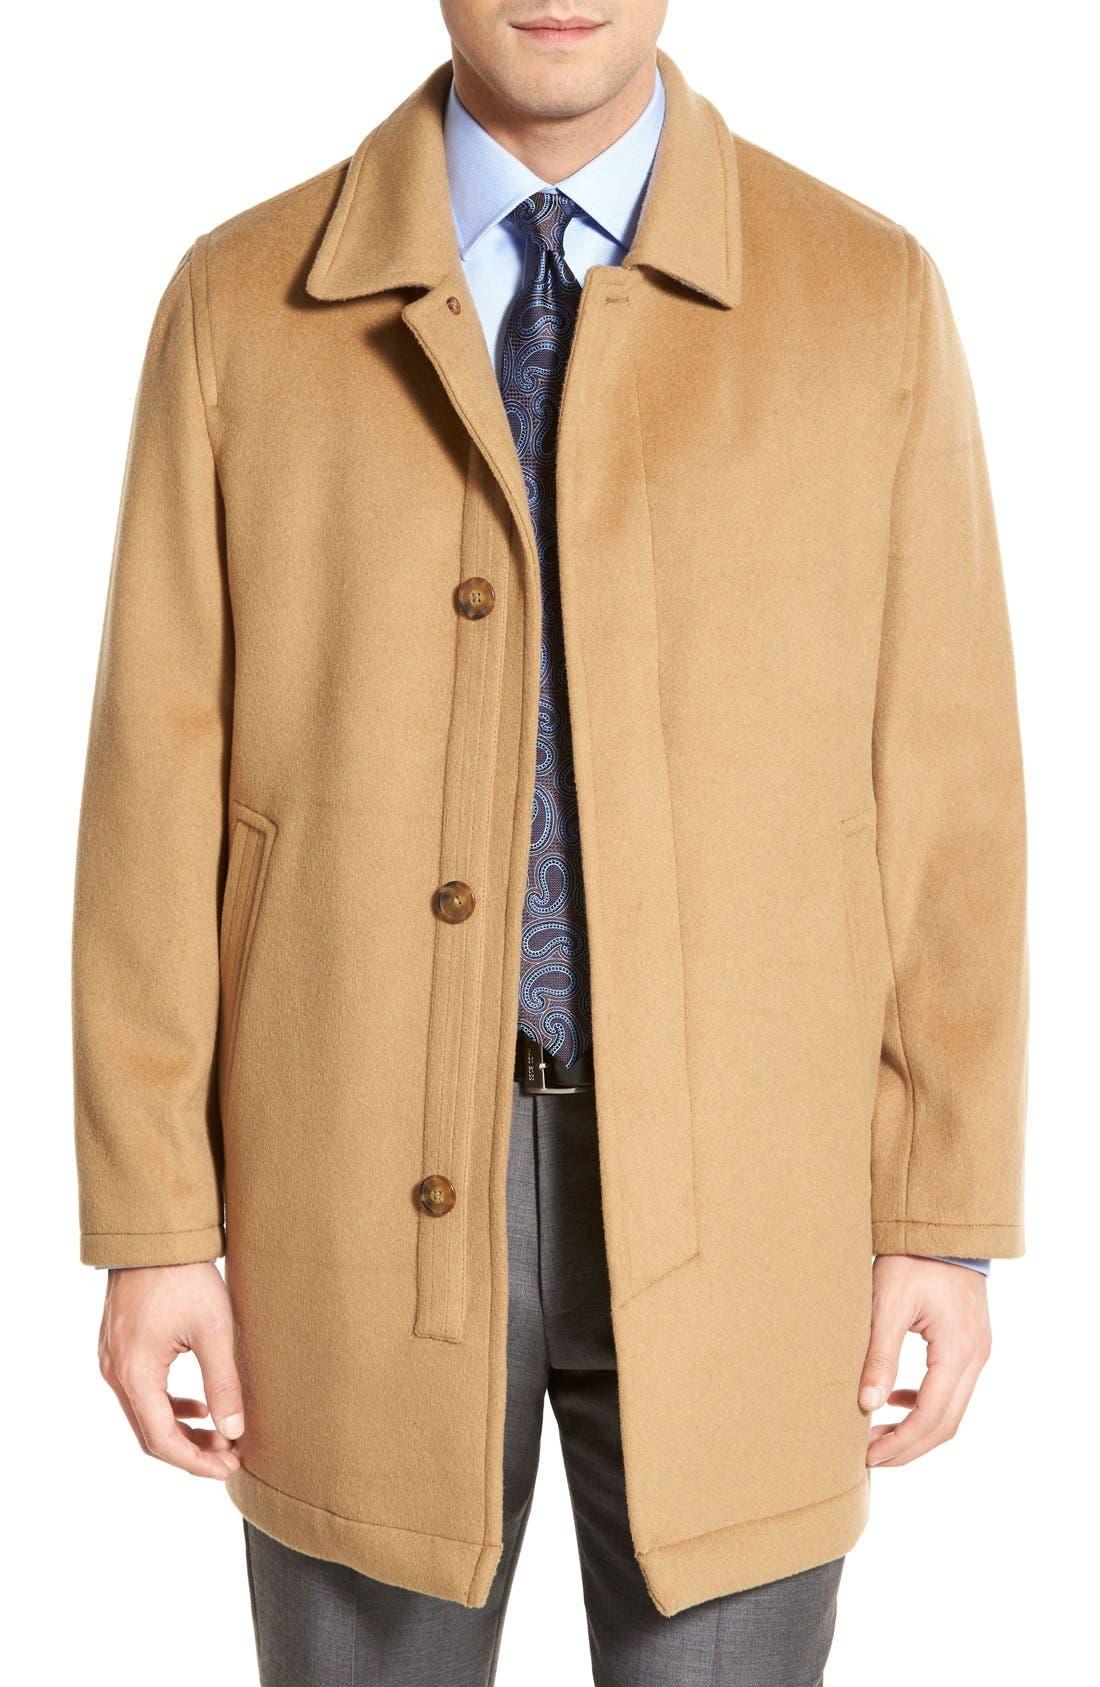 Douglas Modern Fit Wool & Cashmere Overcoat,                         Main,                         color, Camel